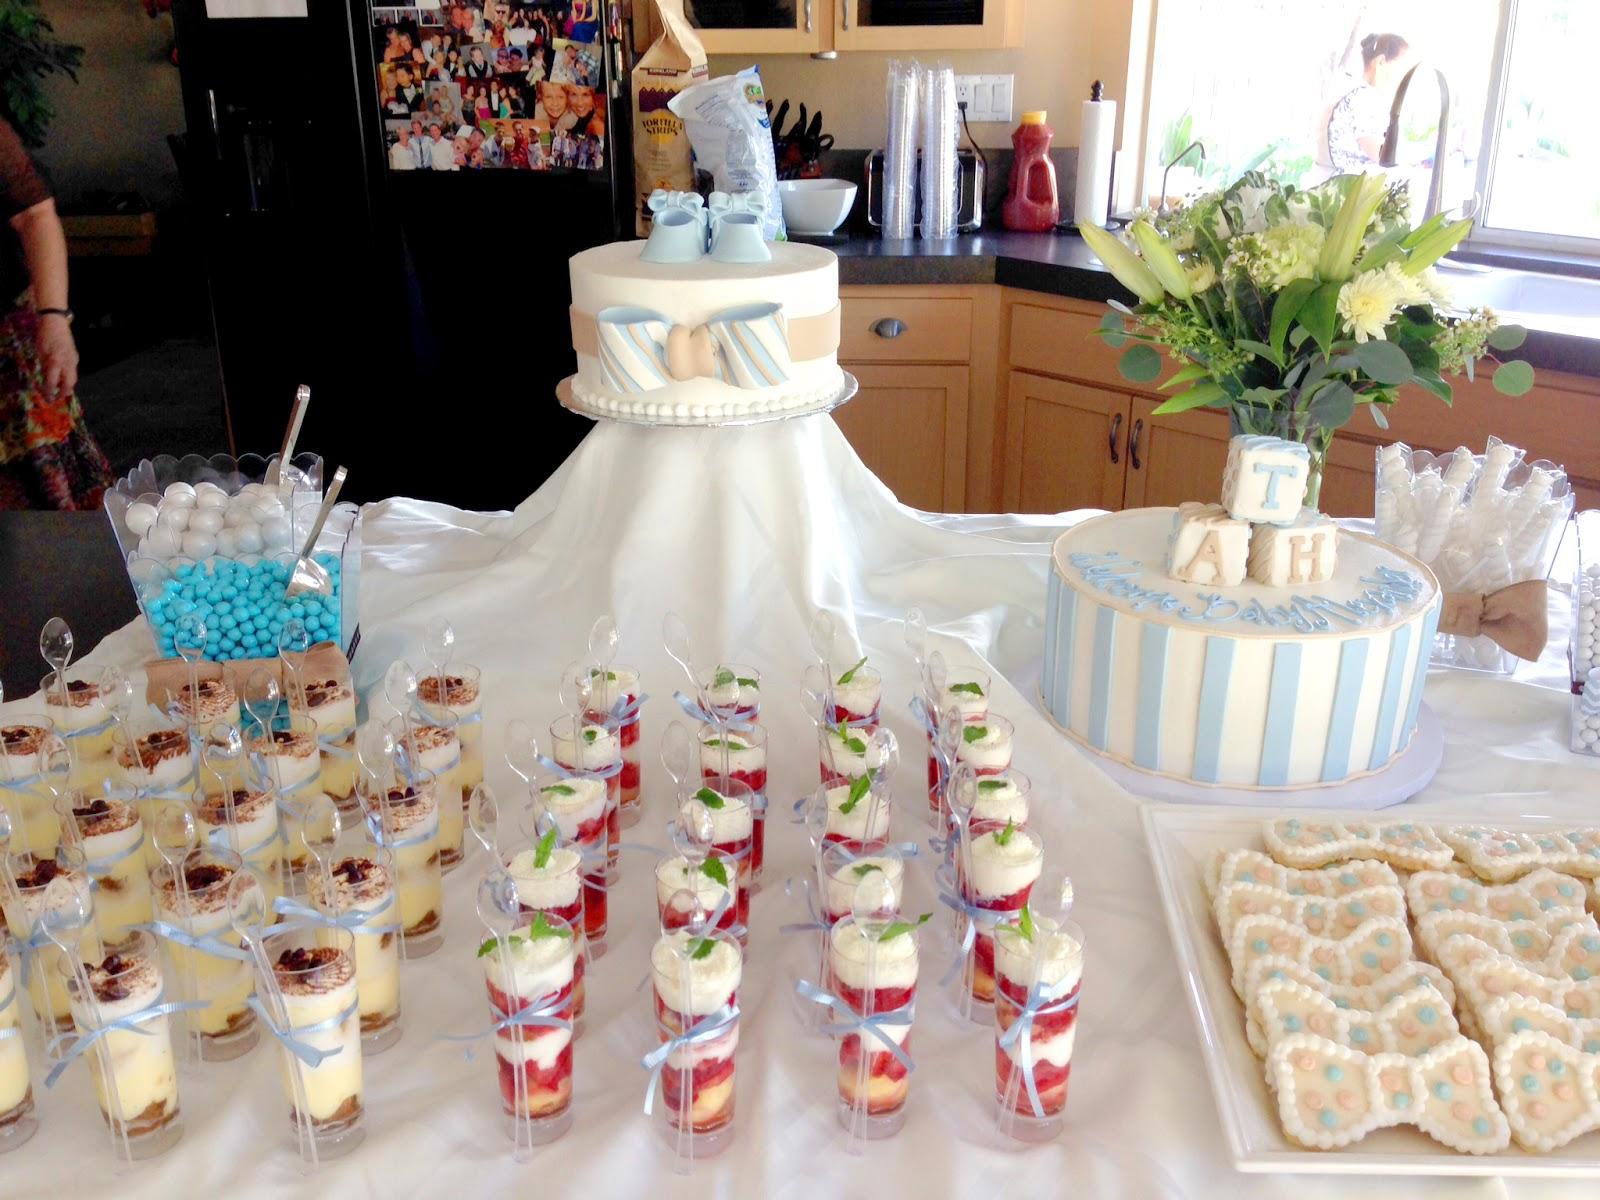 Tiramisu and Strawberry Shortcake Dessert Shots